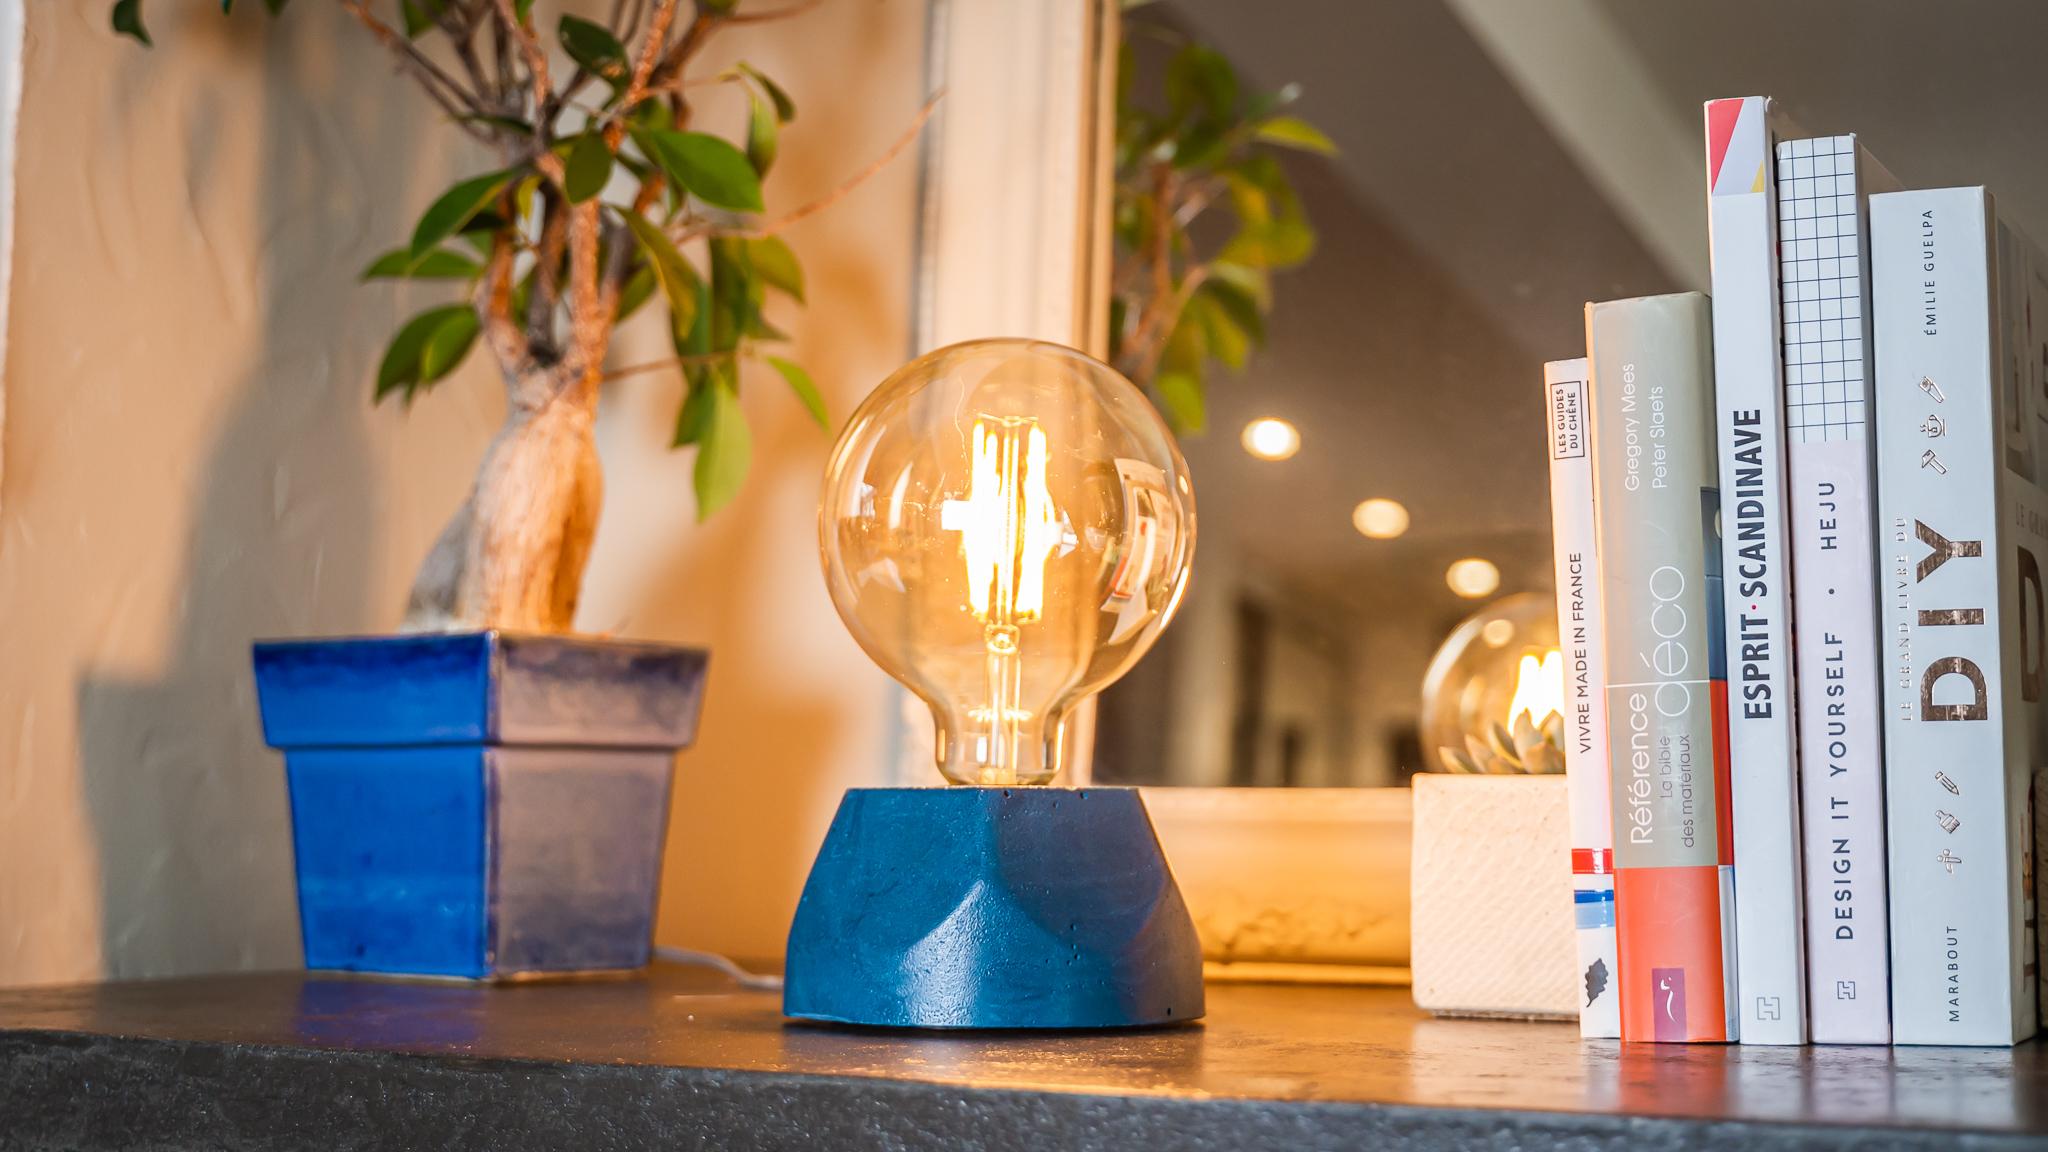 Lampe hexagone en béton bleu pétrole fabrication artisanale